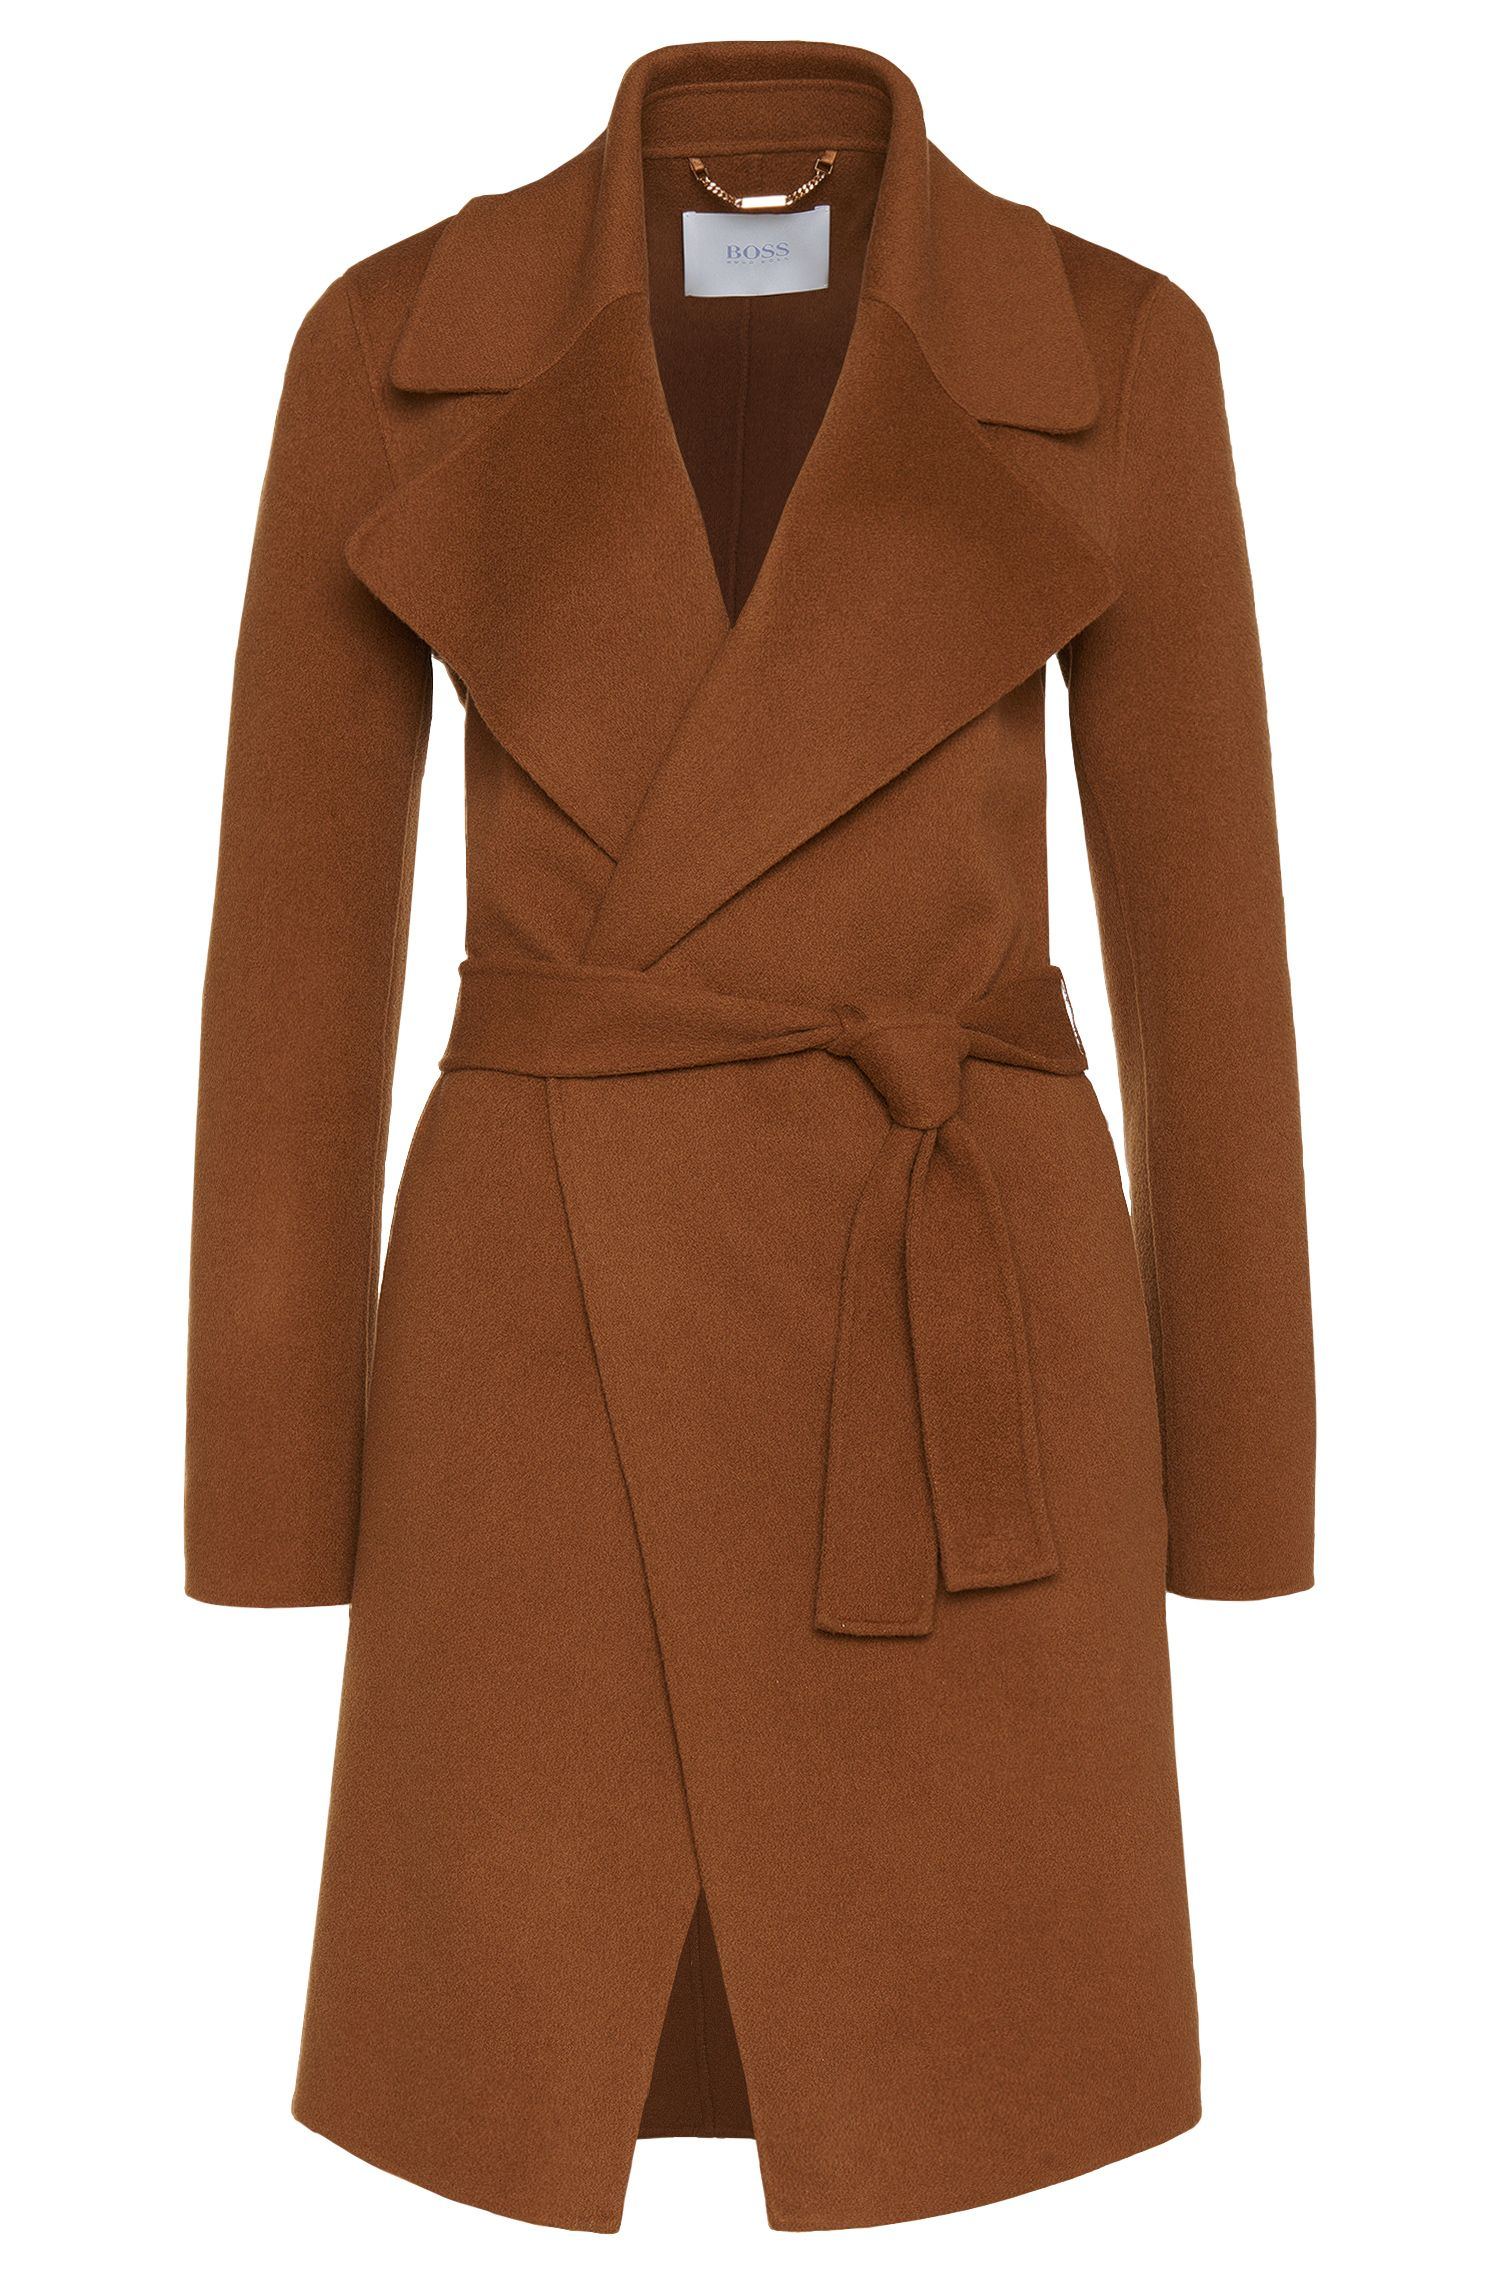 'Citana' | Wool Cashmere Belted Coat